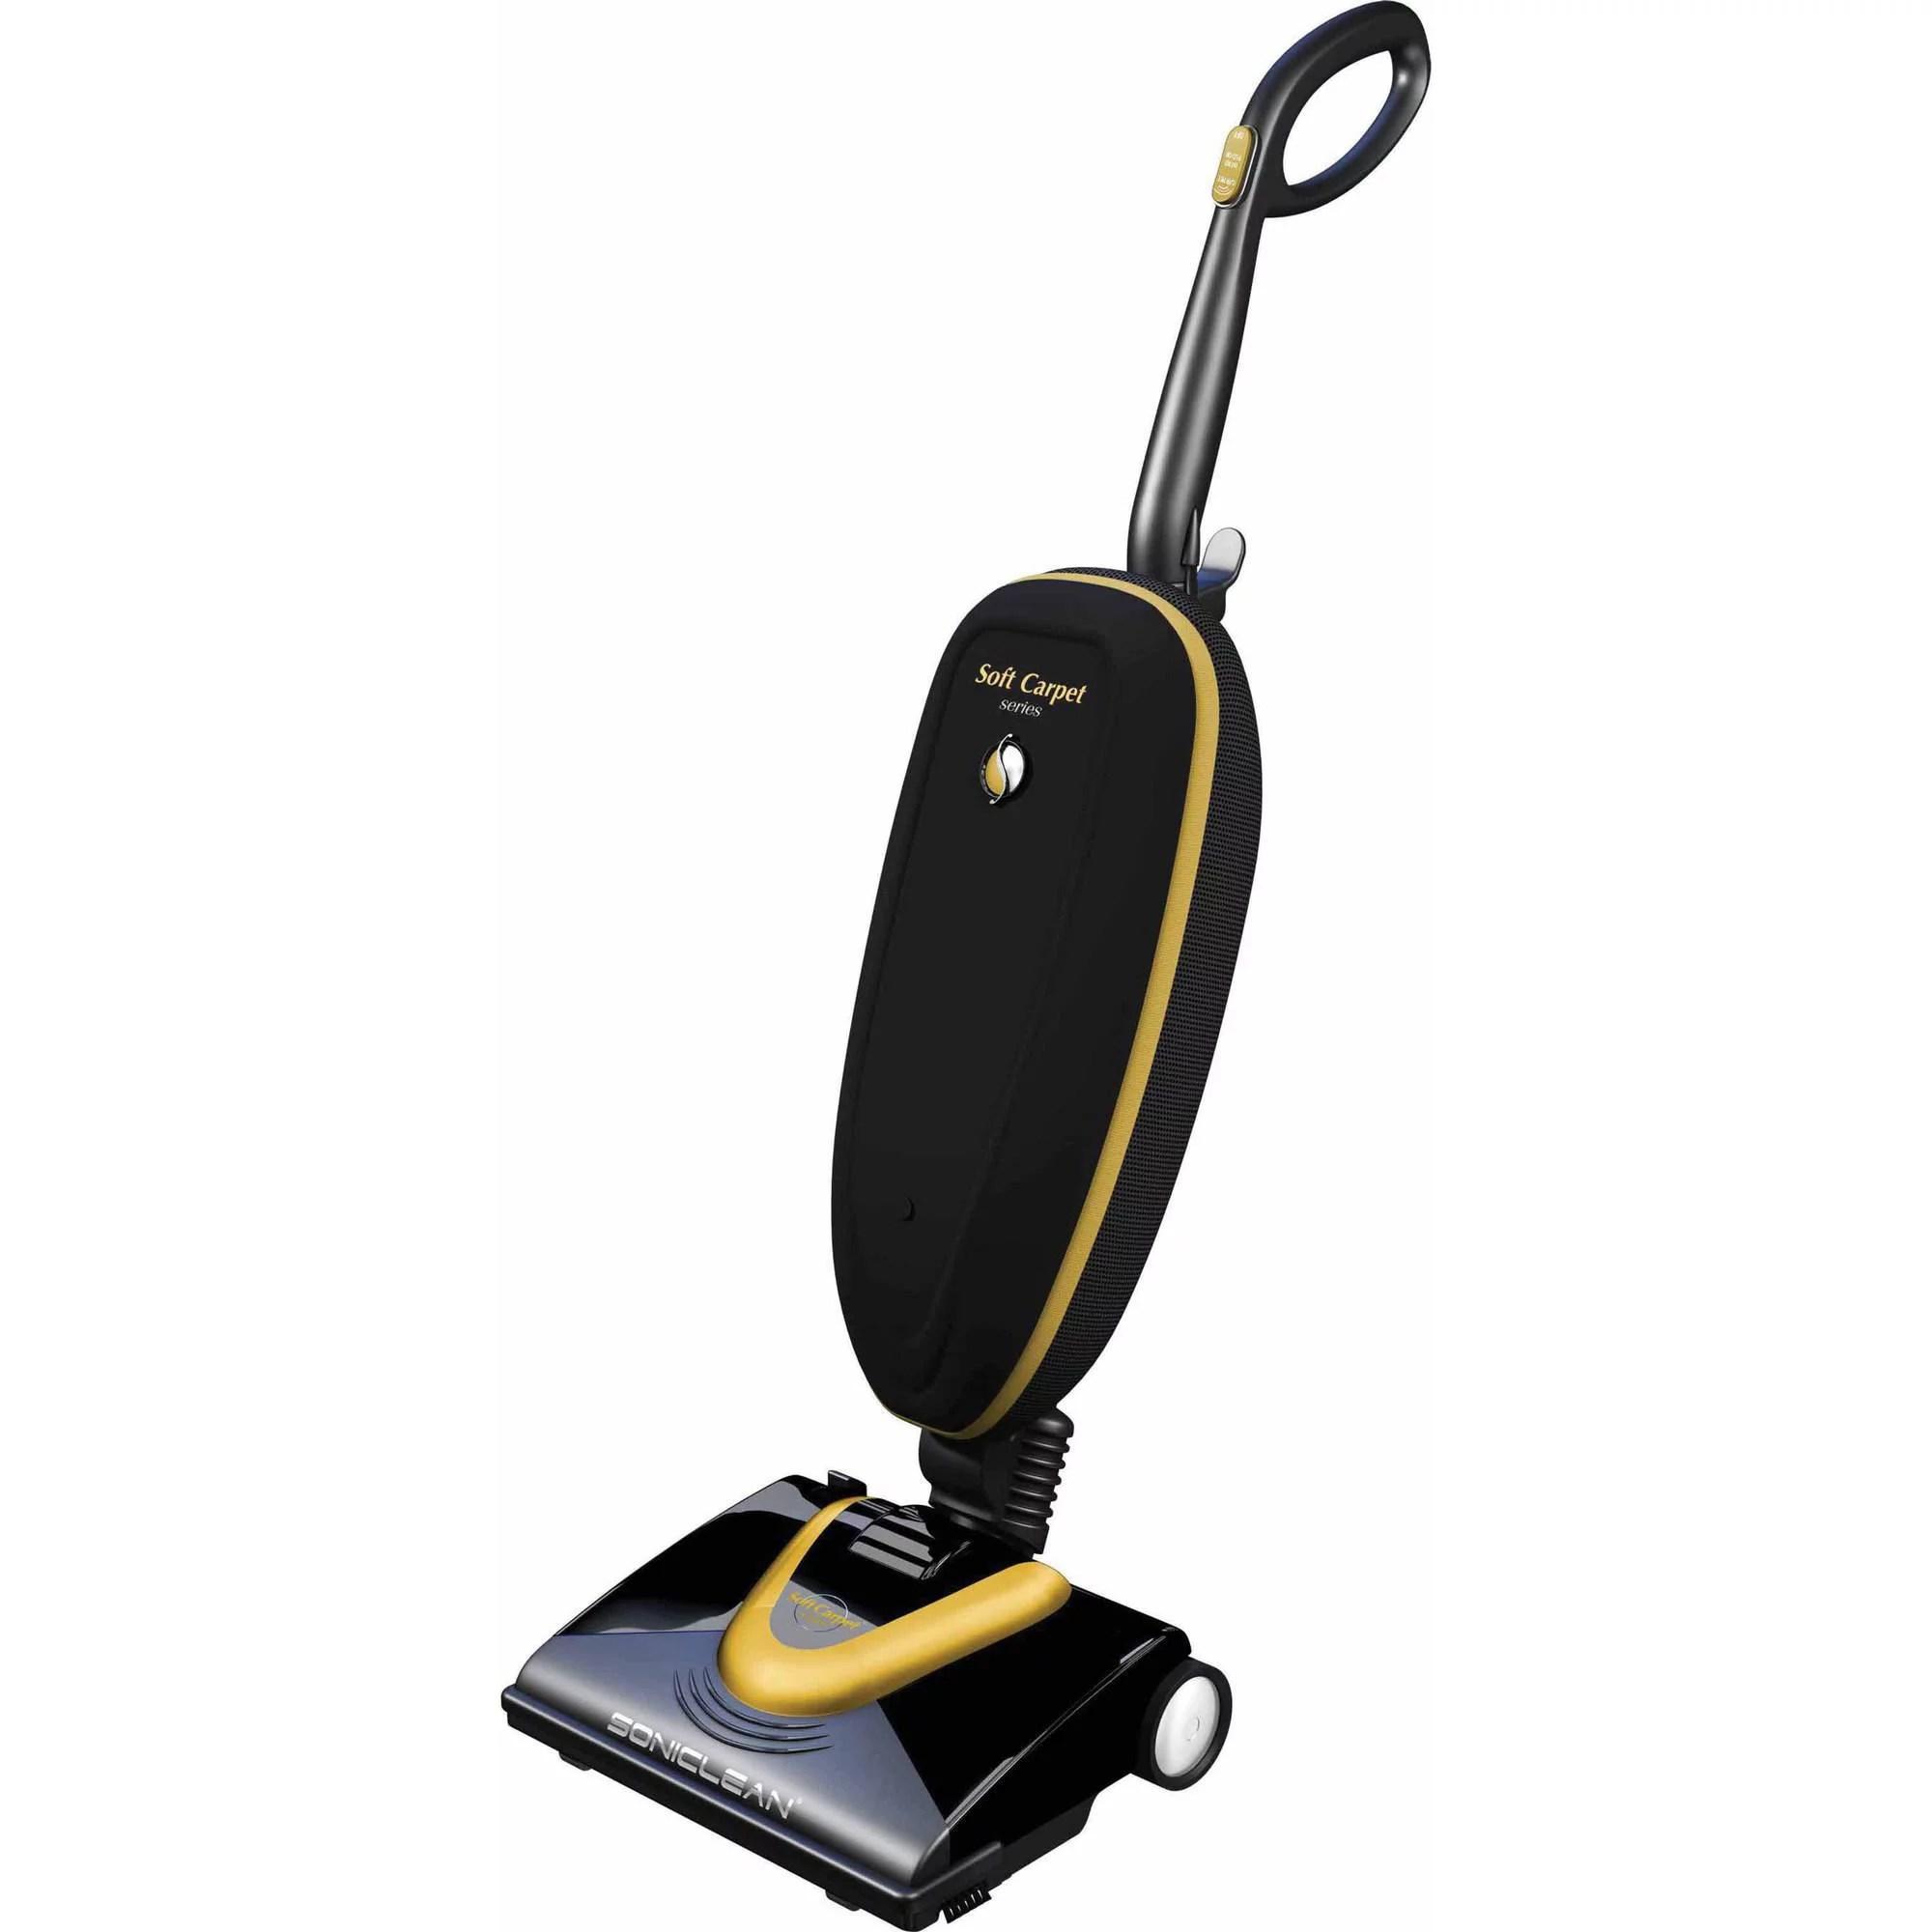 Soniclean Soft Carpet Upright Vacuum Cleaner Walmart Com Walmart Com